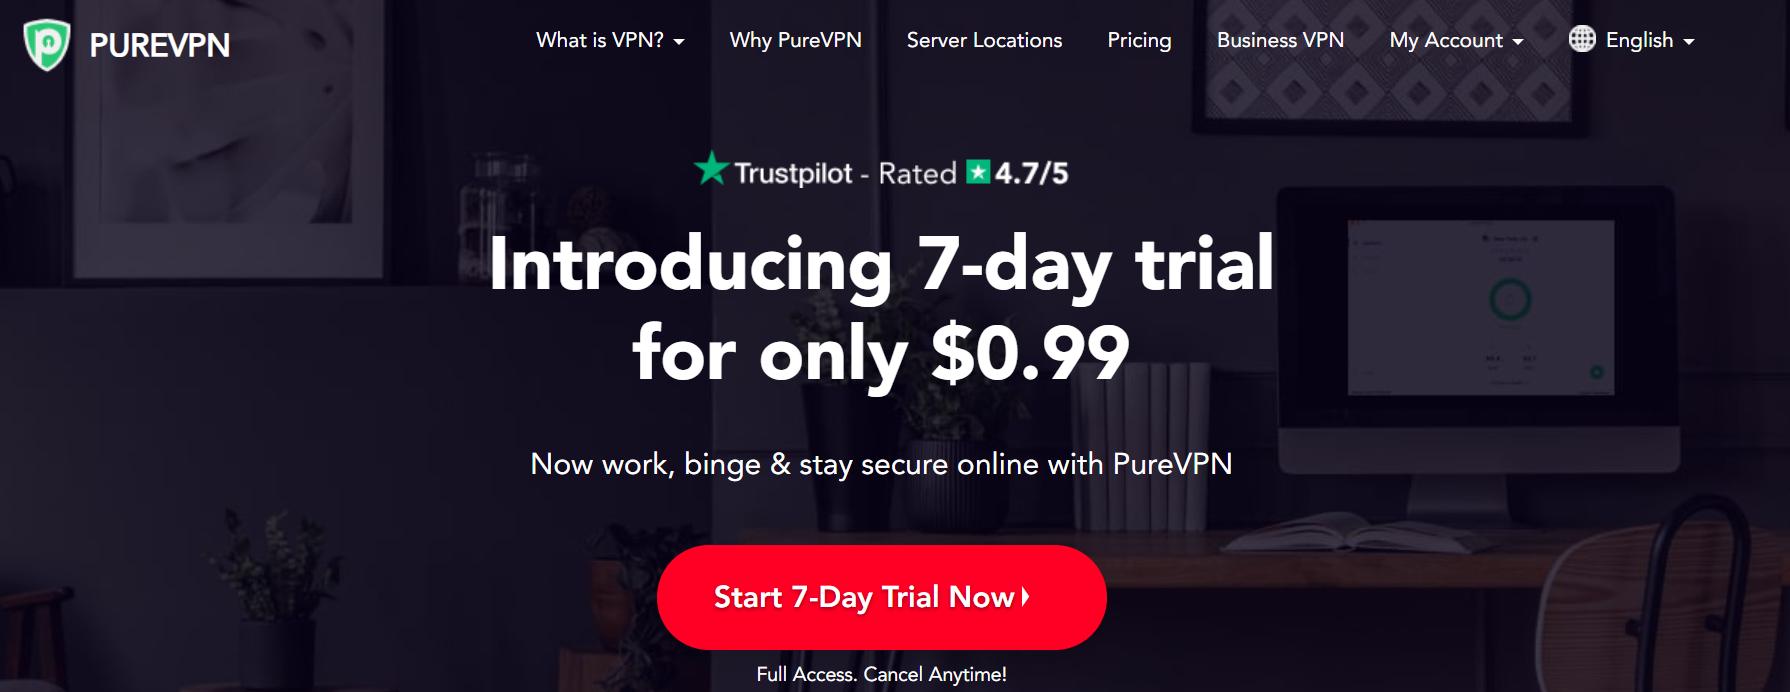 purevpn home page